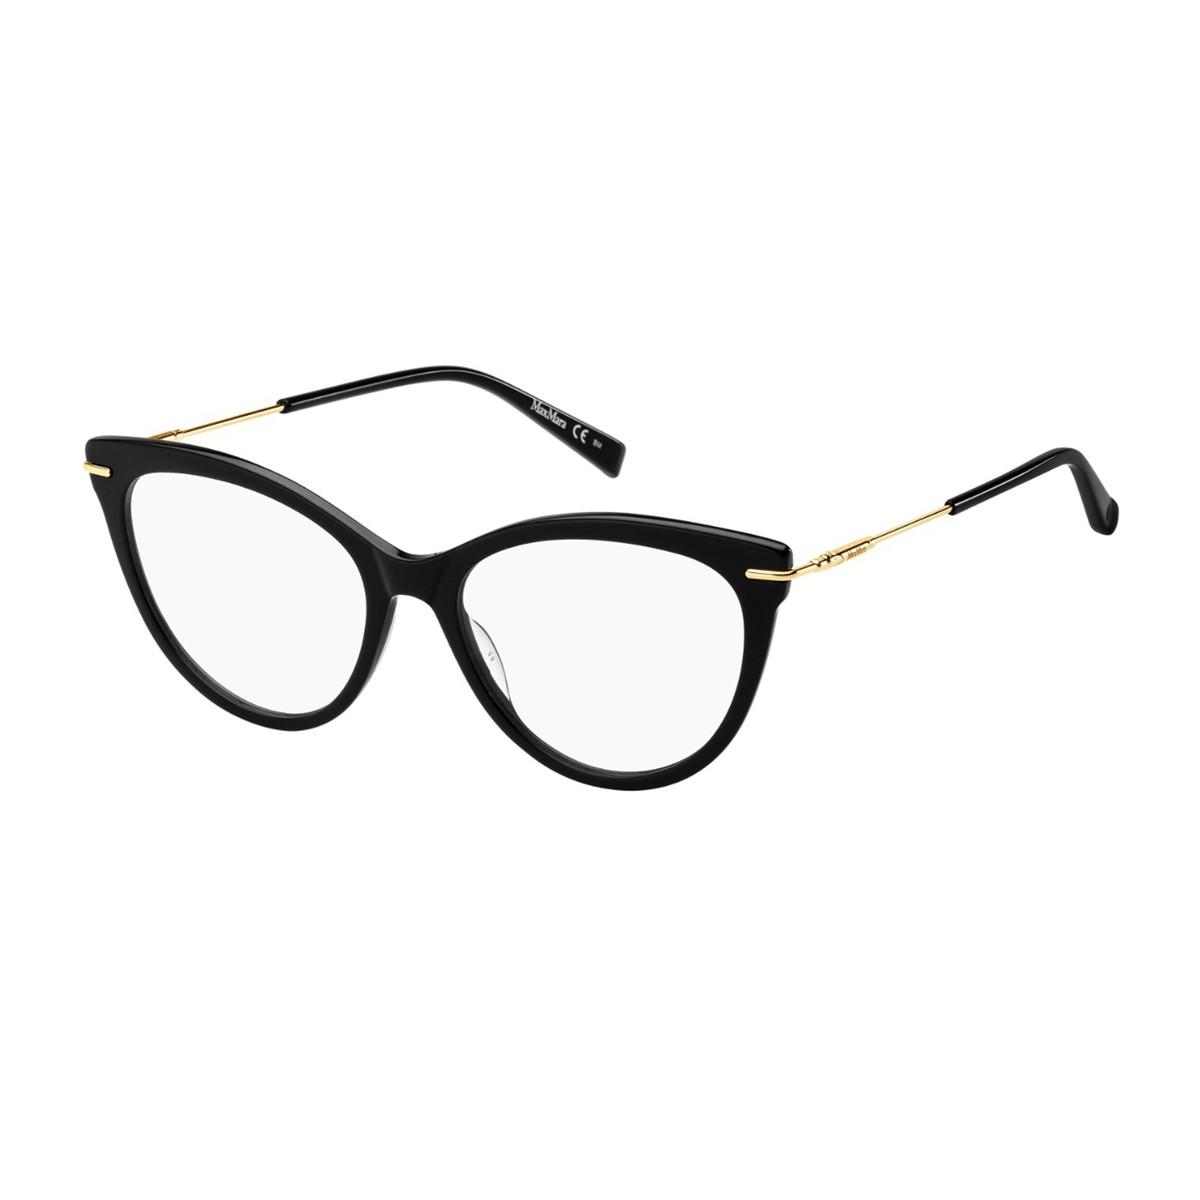 MaxMara MM1419 | Women's eyeglasses